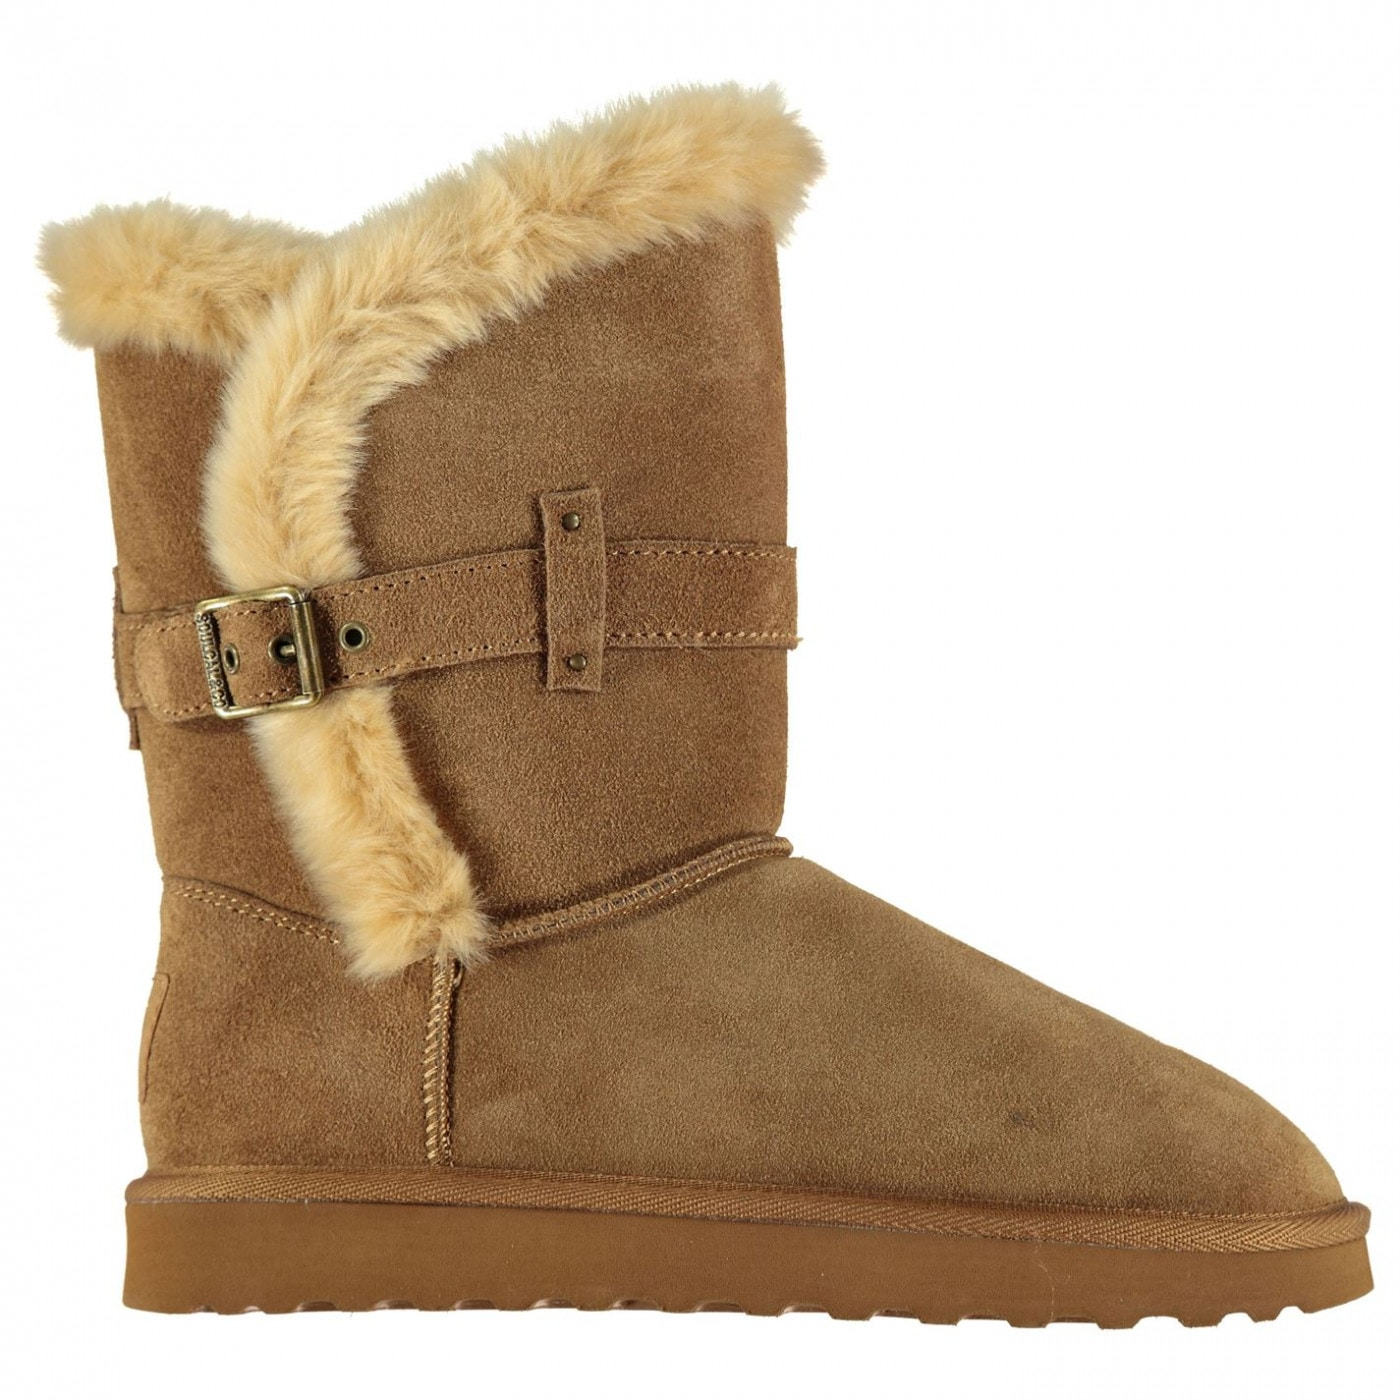 SoulCal Bardi Ladies Snug Boots